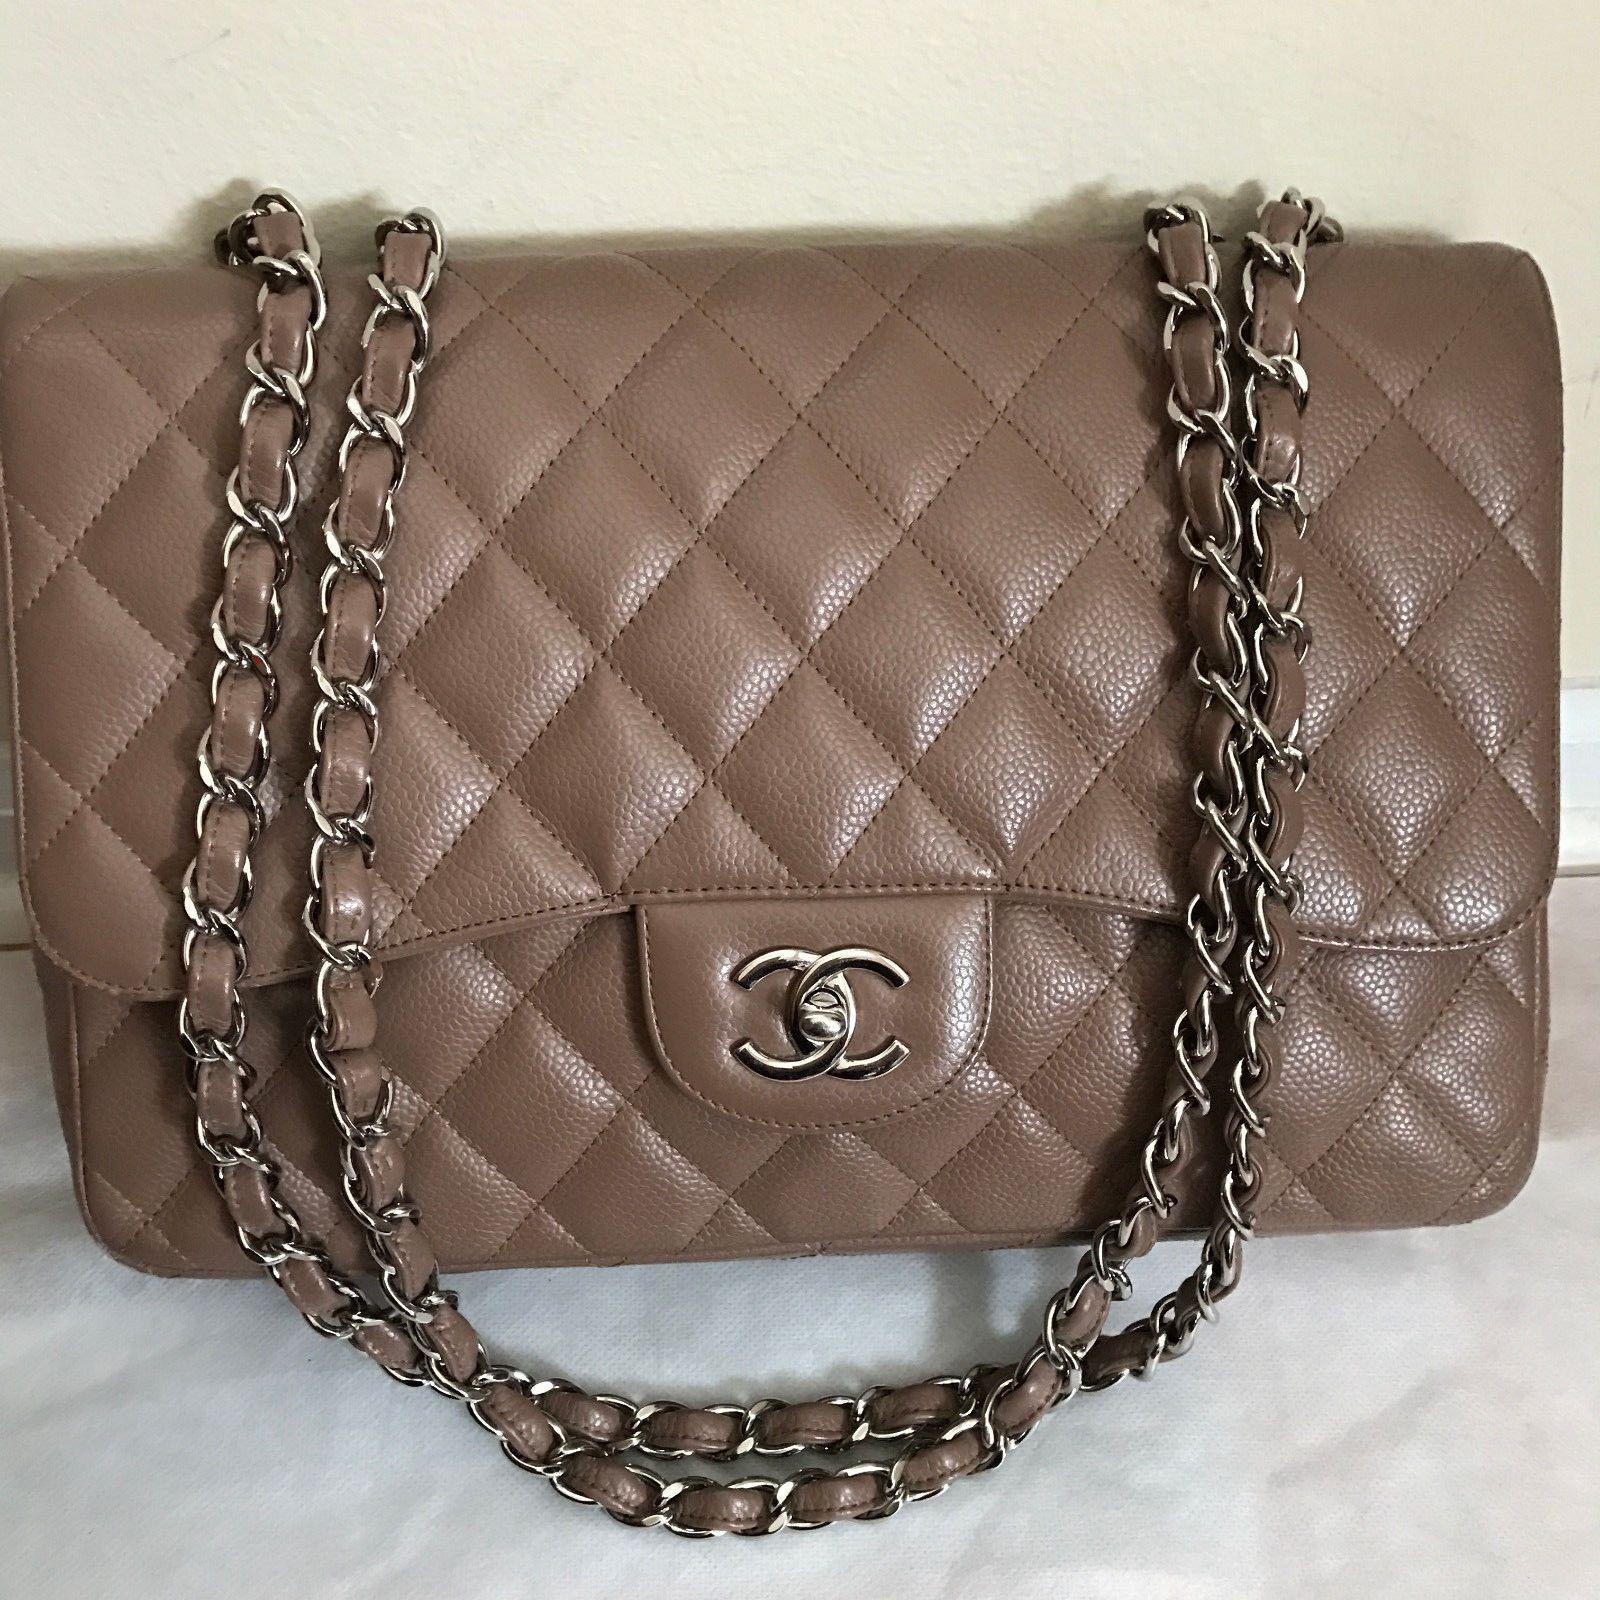 c126146bda83 Authentic Chanel Brown Caviar Jumbo Classic 2.55 Single Flap Bag $2799.0